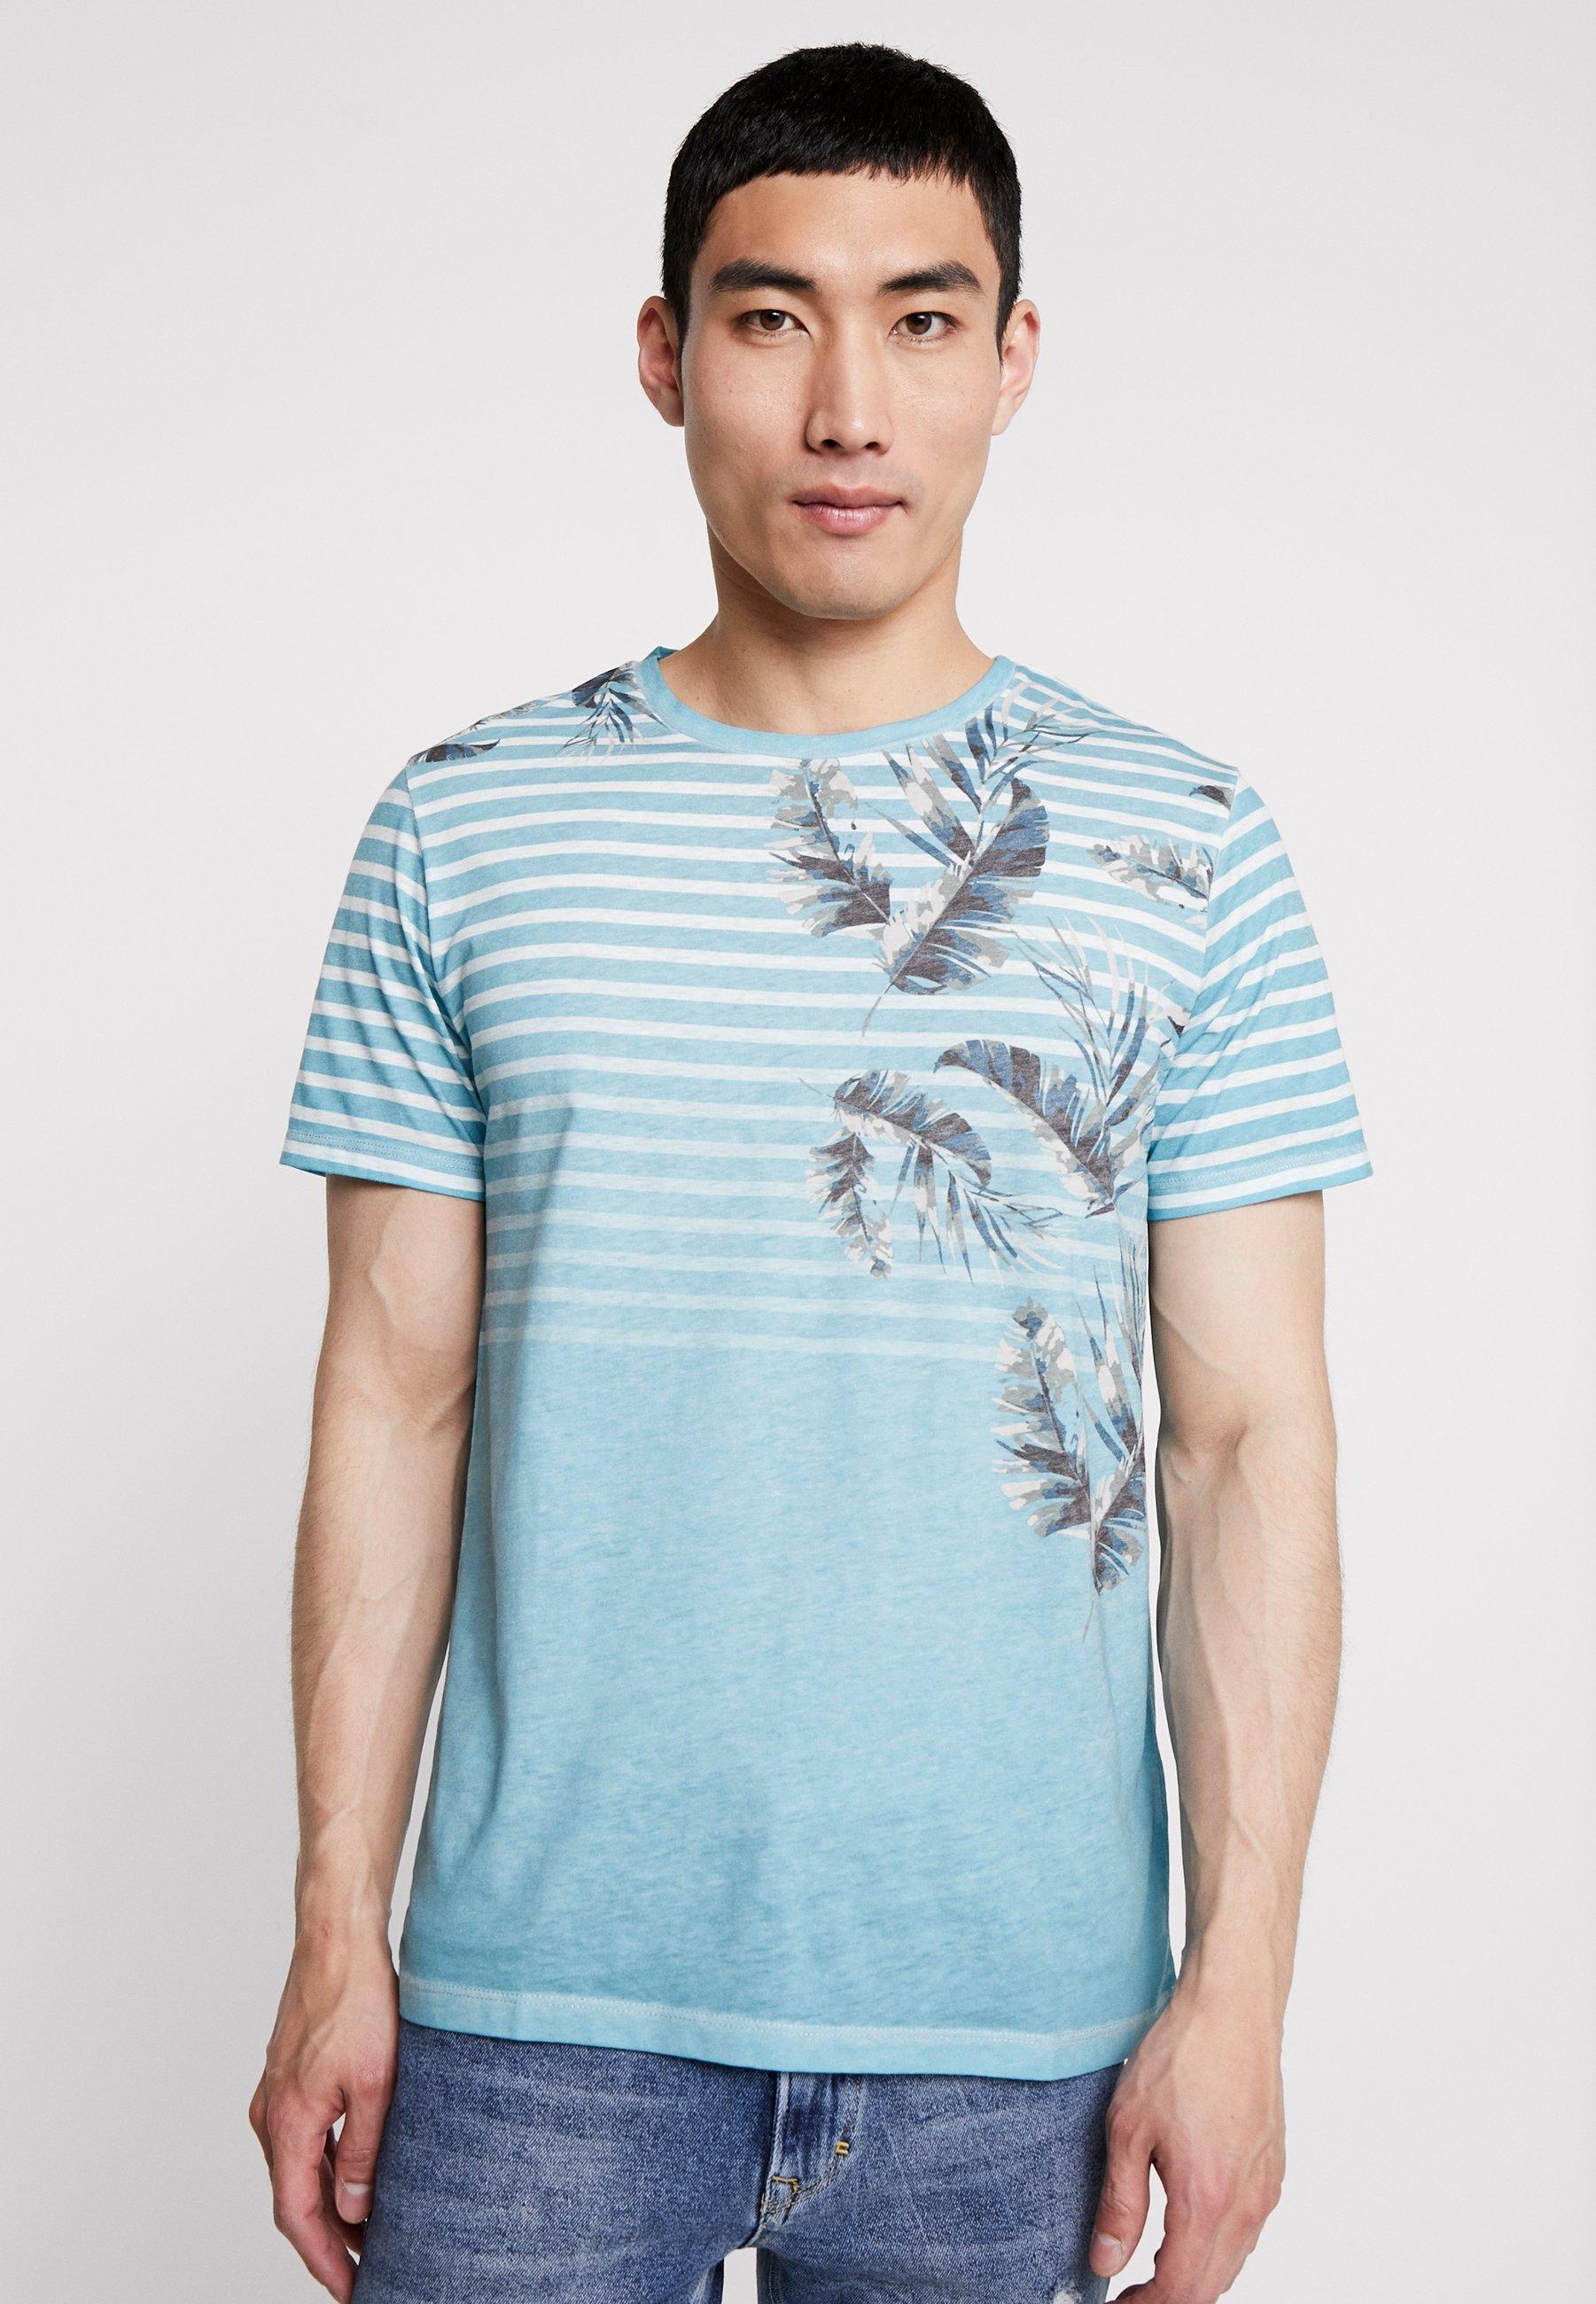 NeckT shirt Stampa Light Crew Blue Tee Con Jackamp; Jones Jorstripe Kalex kXZiOPu